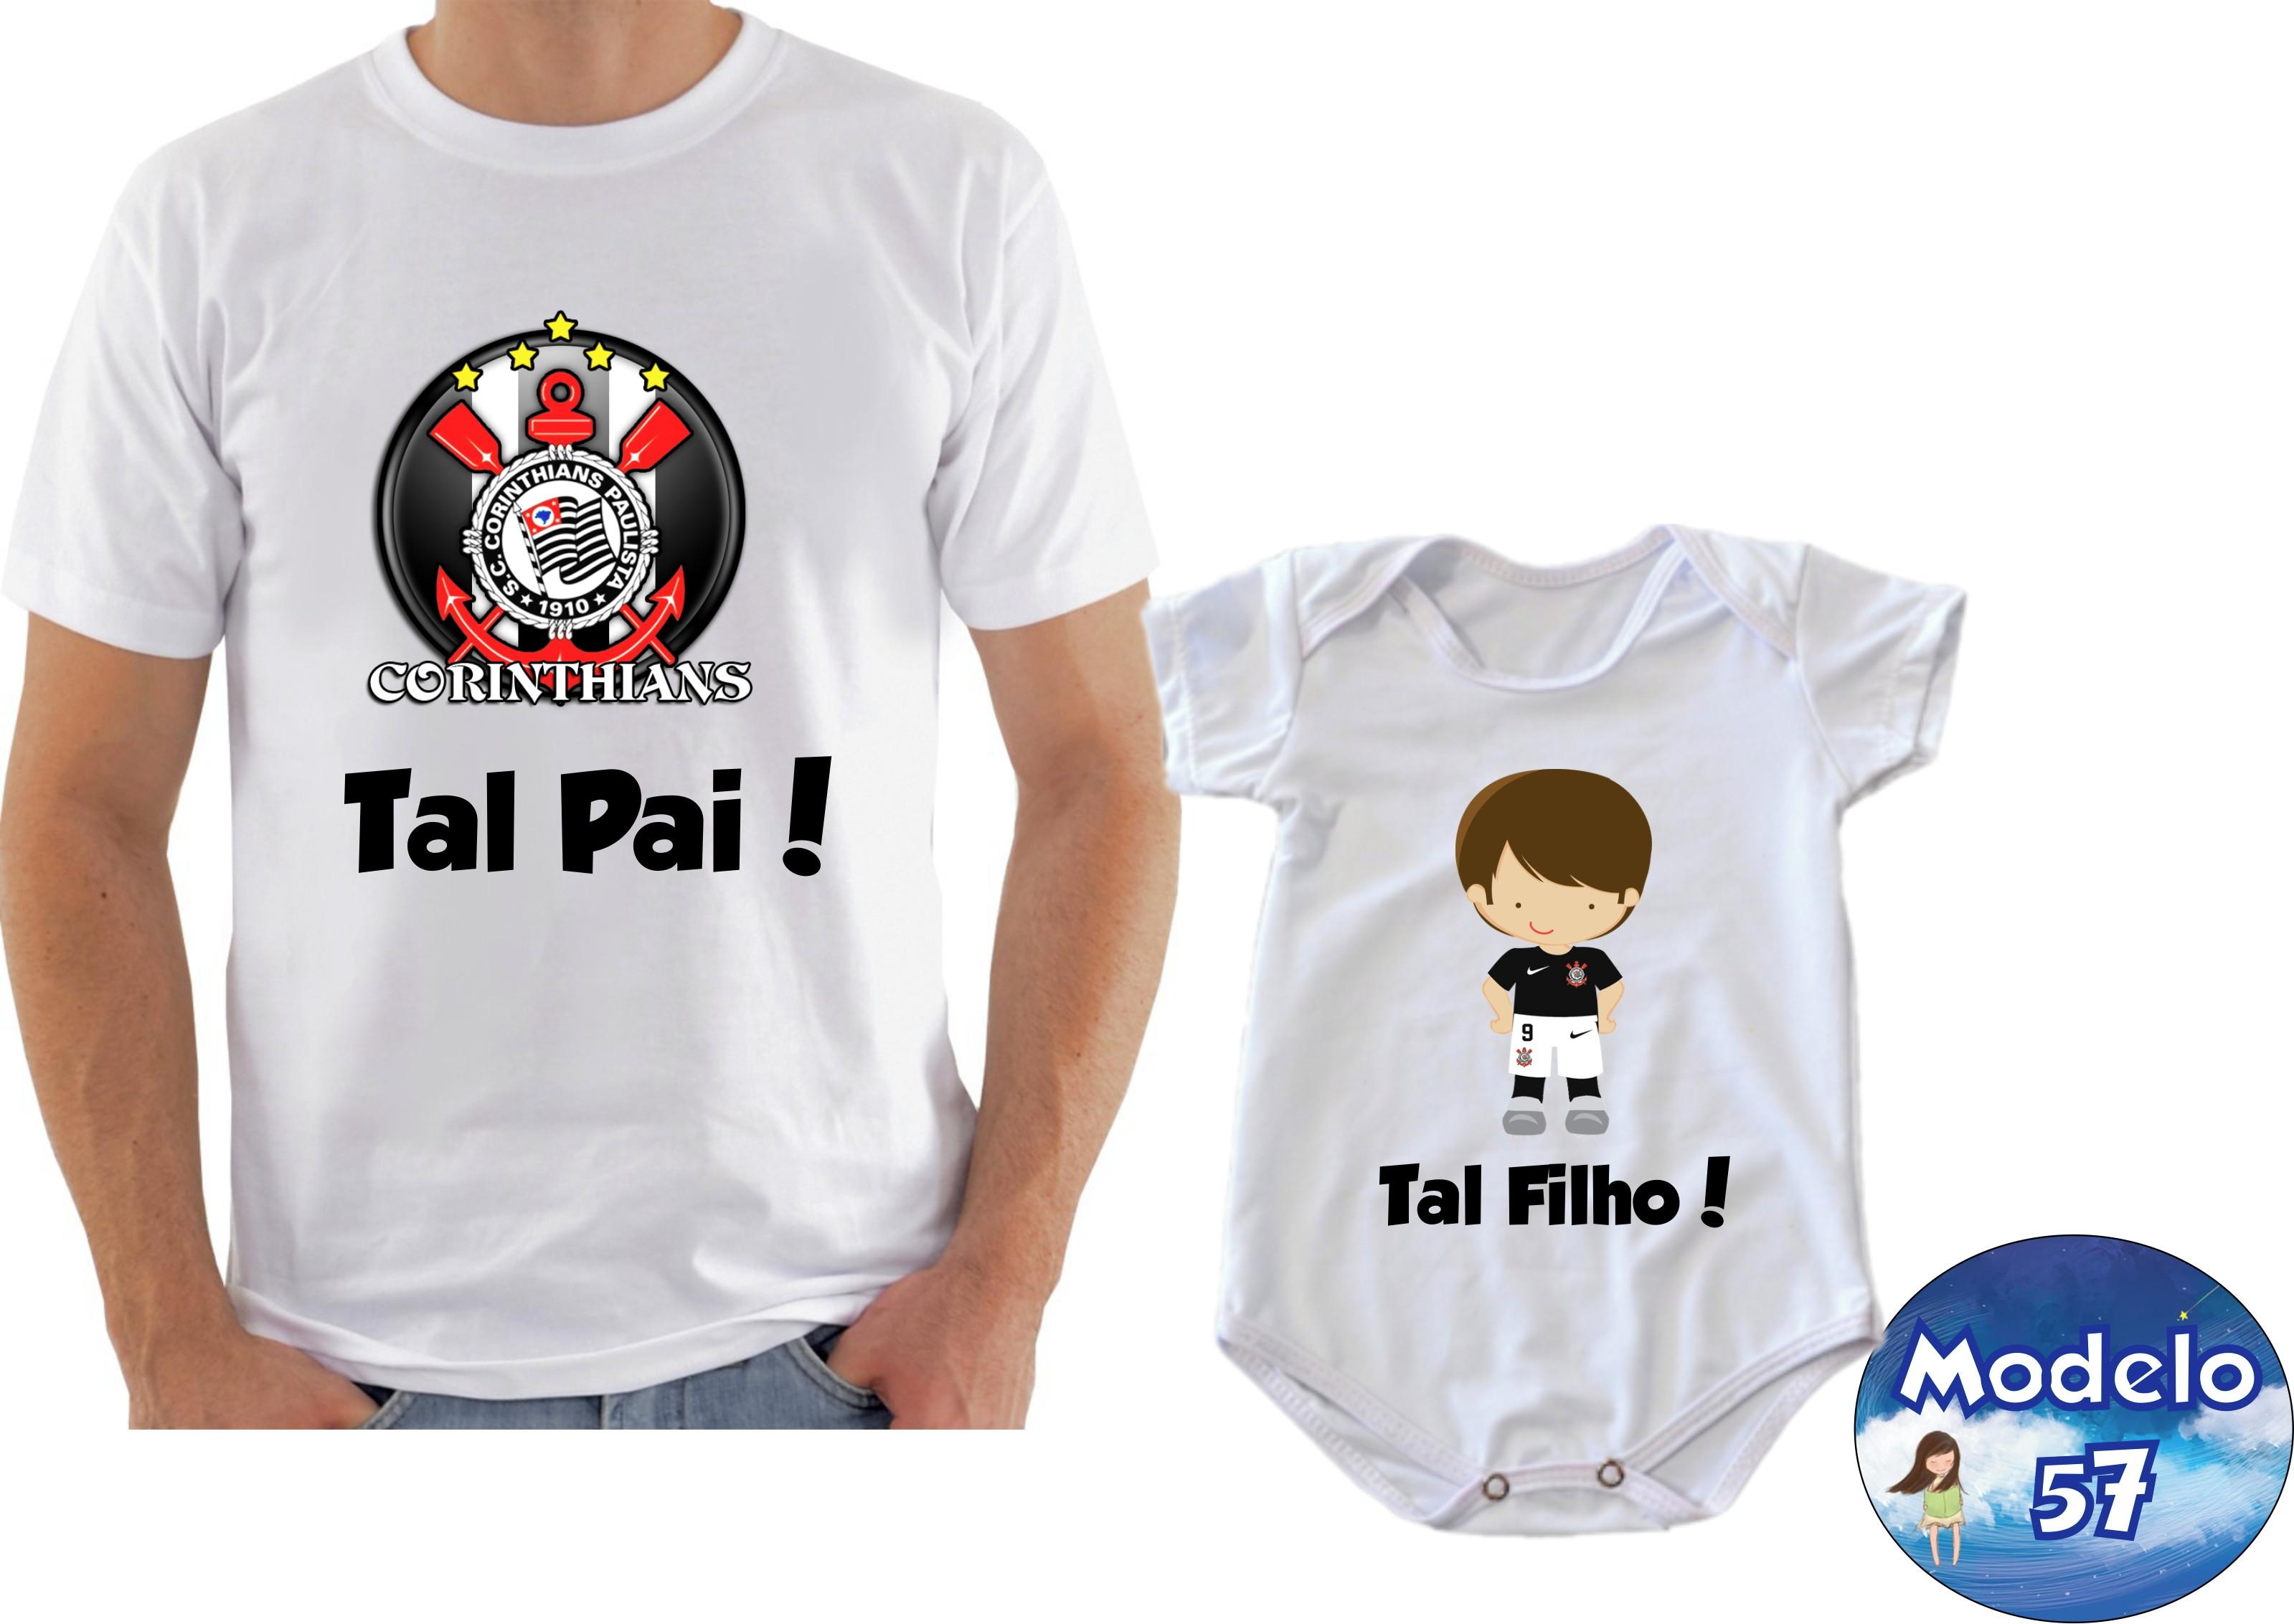 ba69932bb9378 Camiseta Body Personalizadas Tal Pai Tal Filho com 2 Und